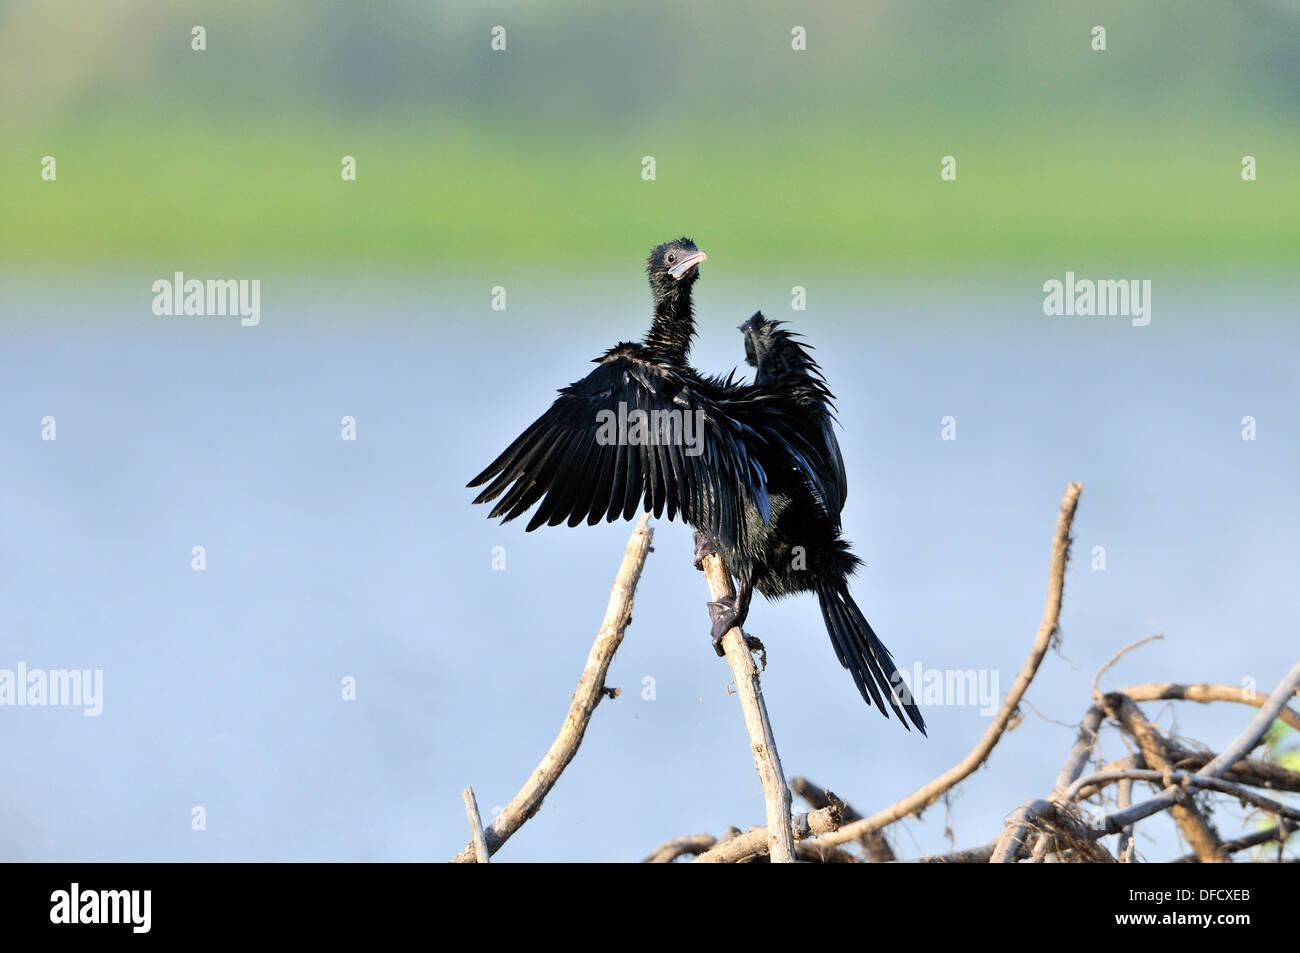 Great Cormorant - Stock Image